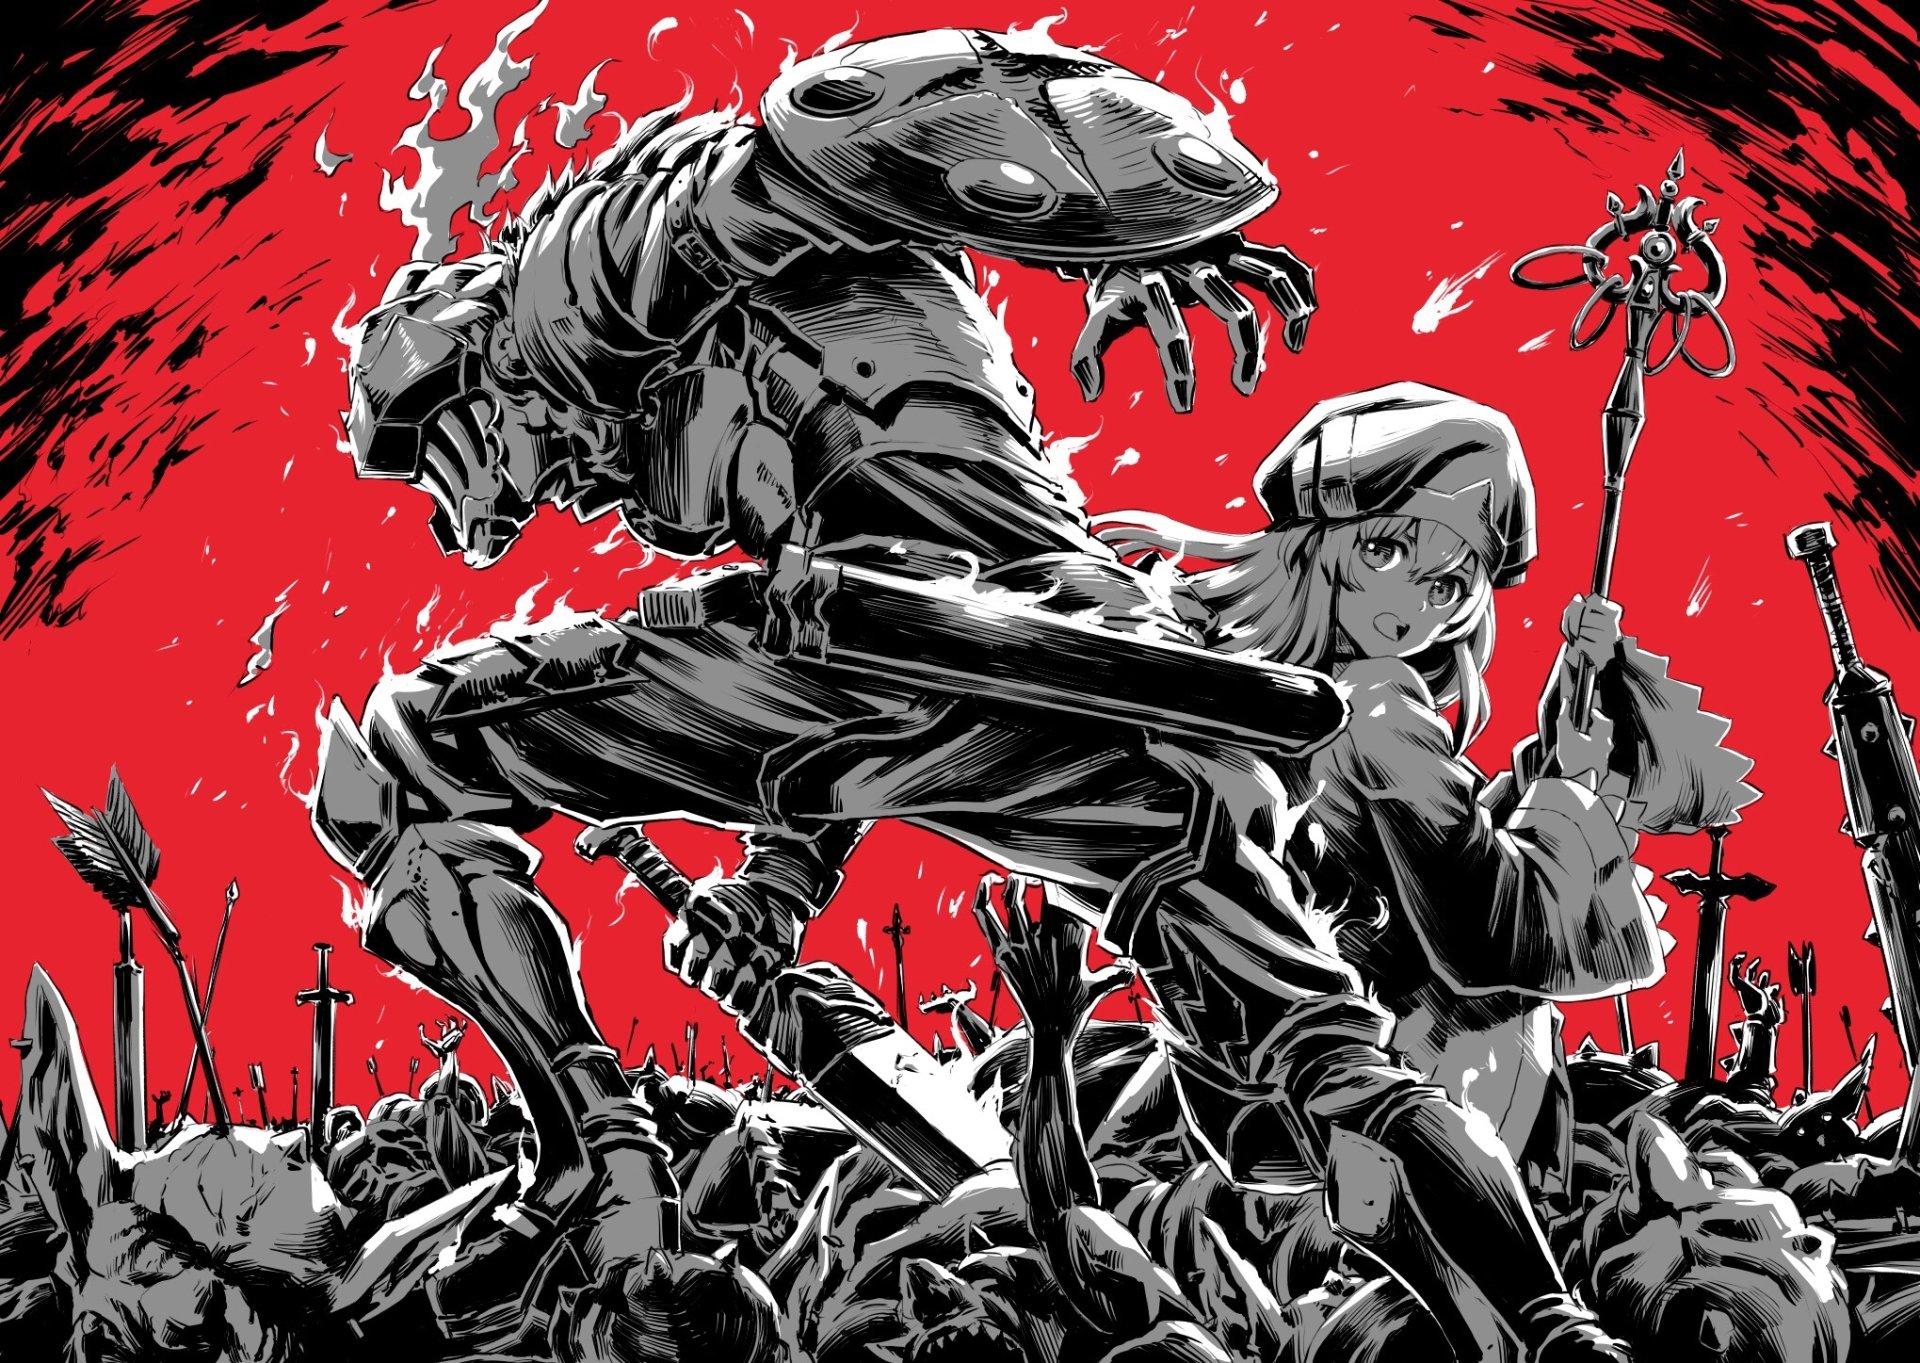 Goblin Slayer A Gallery By: CrazyDiamond - Wallpaper Abyss